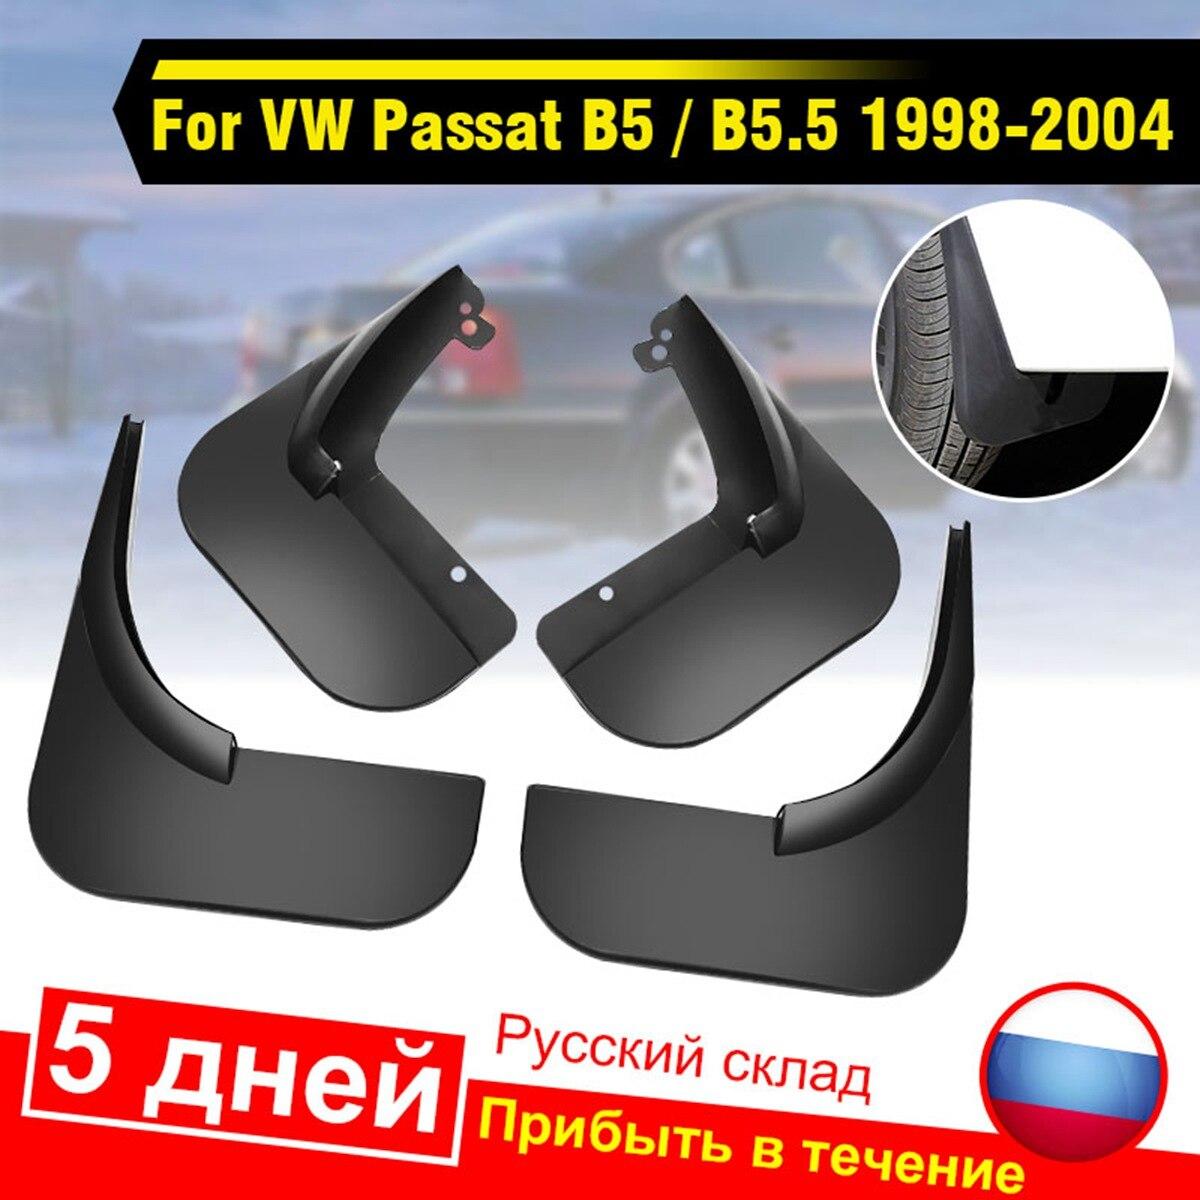 4Pcs Car Front Rear Mud Flap Mudguards Splash Guards for VW Passat B5 / B5.5 1998-2004